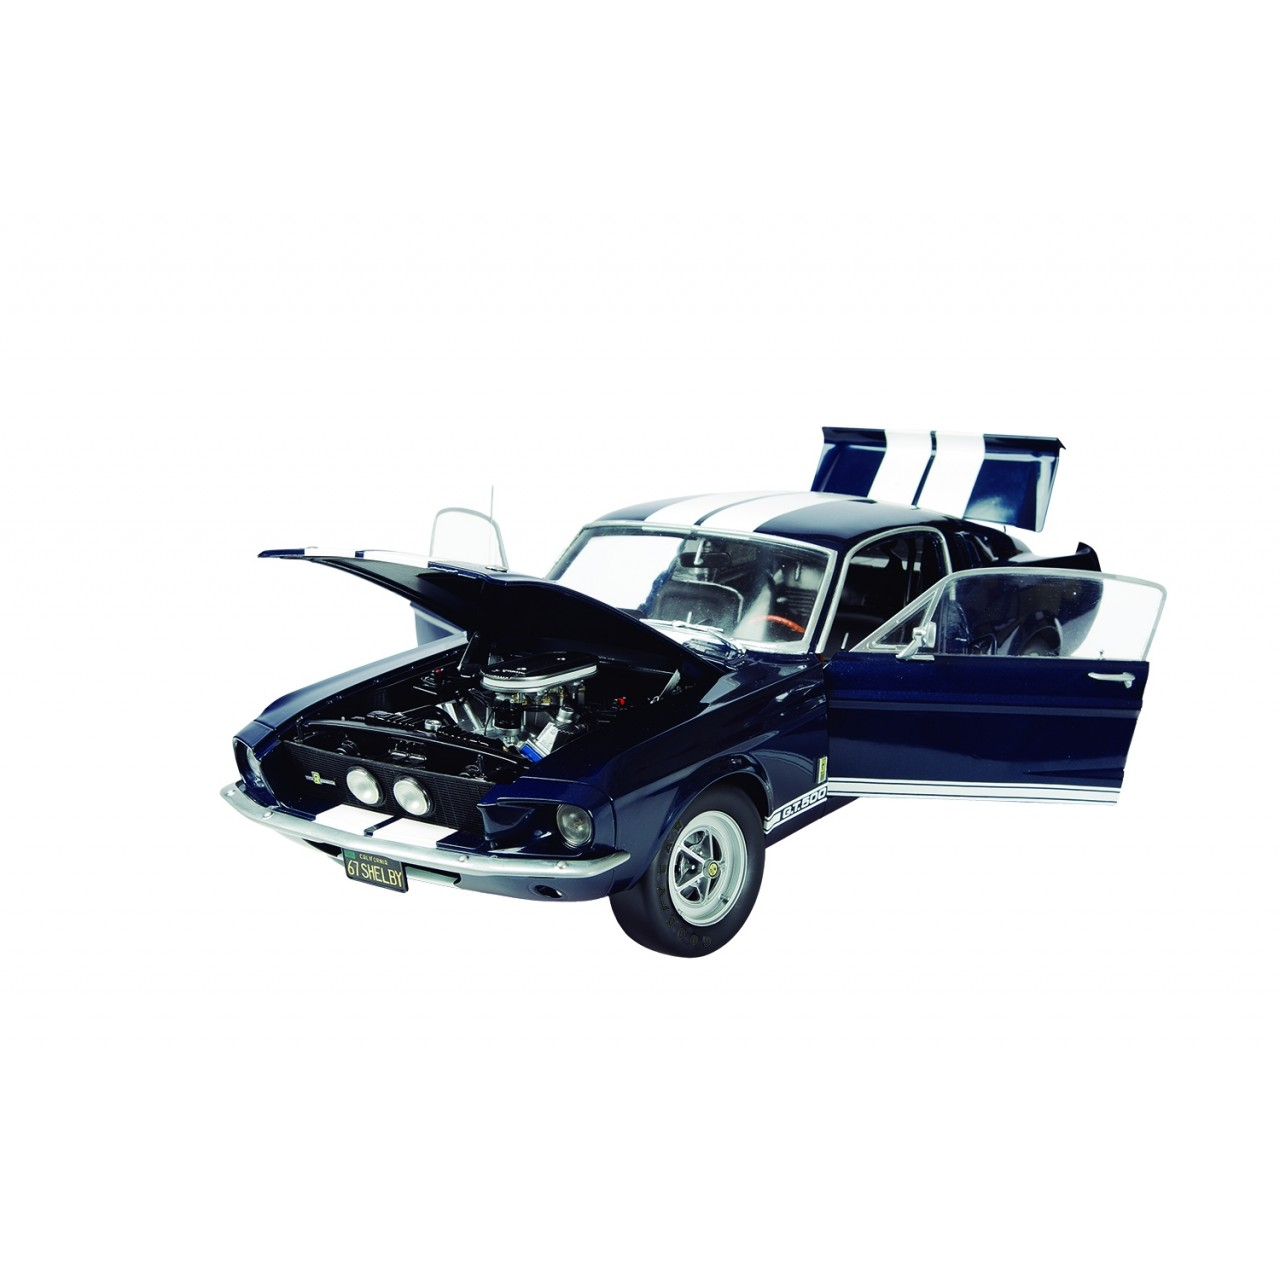 NUMERO 33 Montez votre Ford Mustang Shelby GT-500 1967 Echelle 1//8 Altaya No